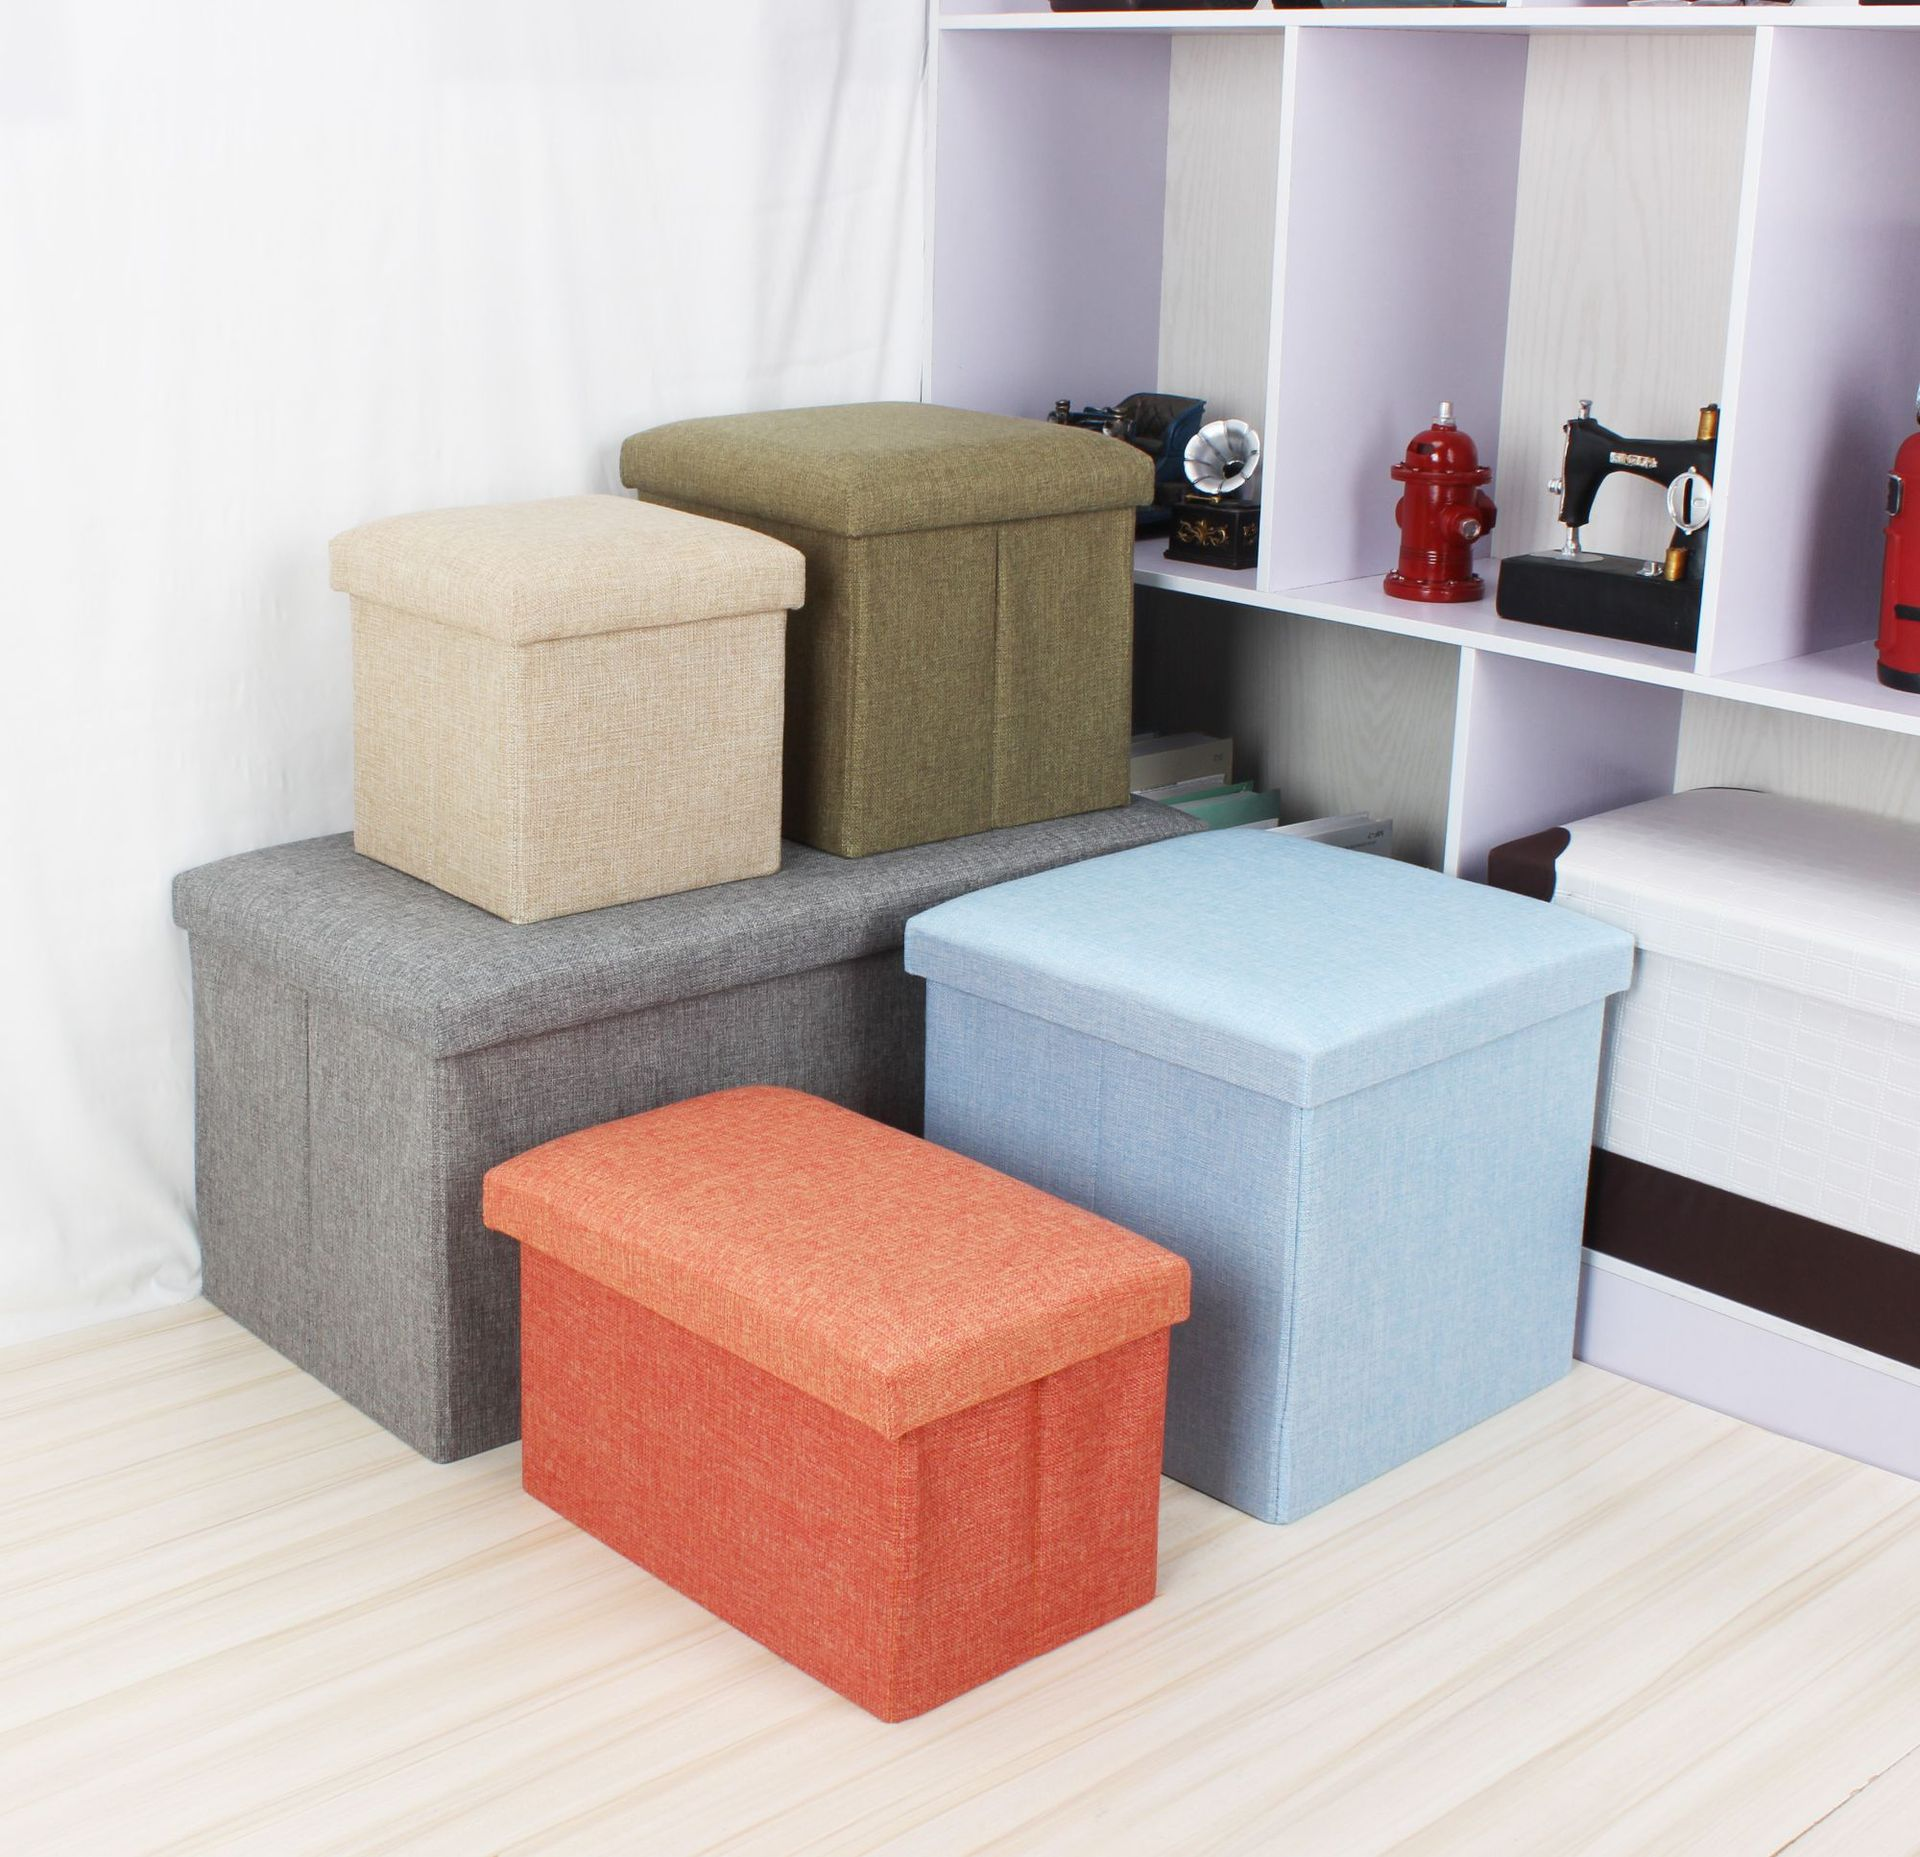 Creative Home Large Size Folding Storage Stool Home Storage Box Shoes Storage Chair Fabric Finishing Box Customizable